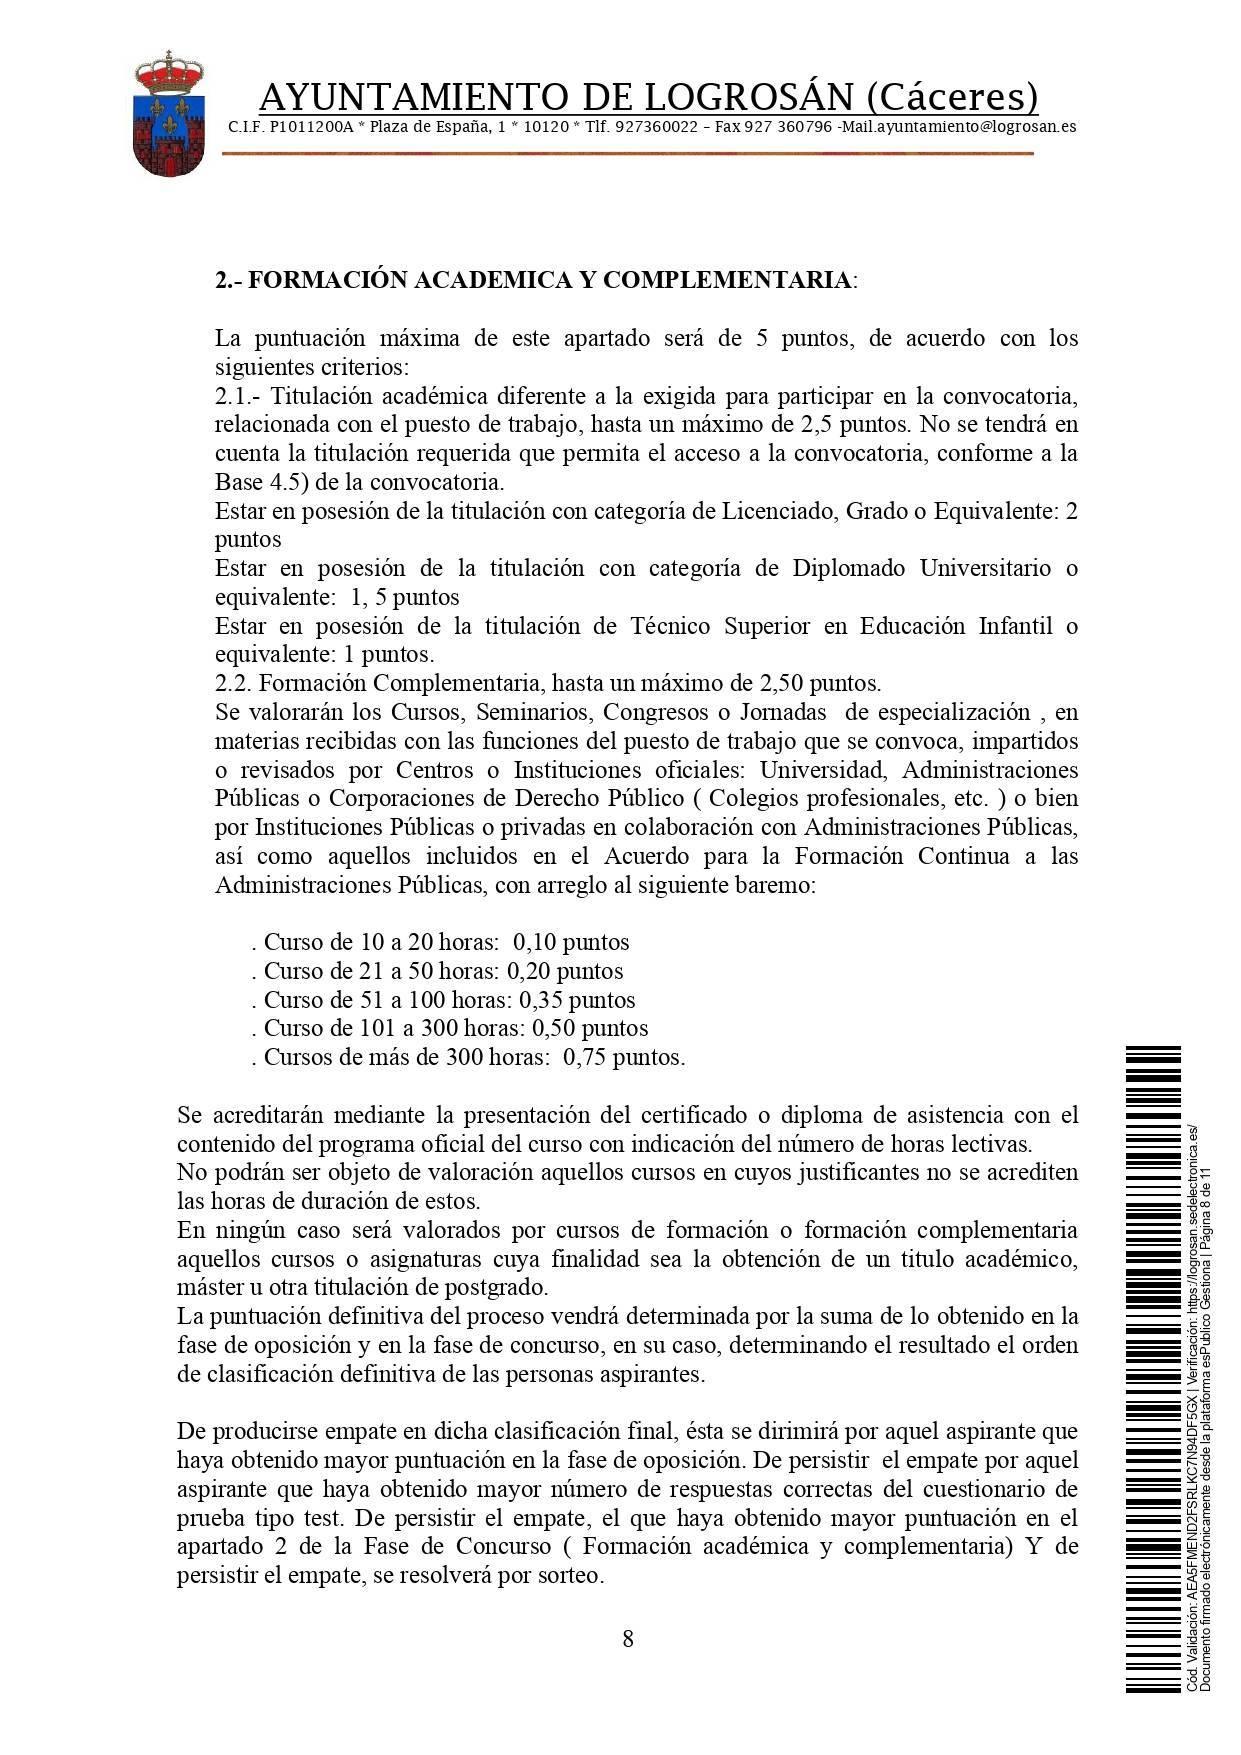 Bolsa de técnicos-as en educación infantil (2021) - Logrosán (Cáceres) 8